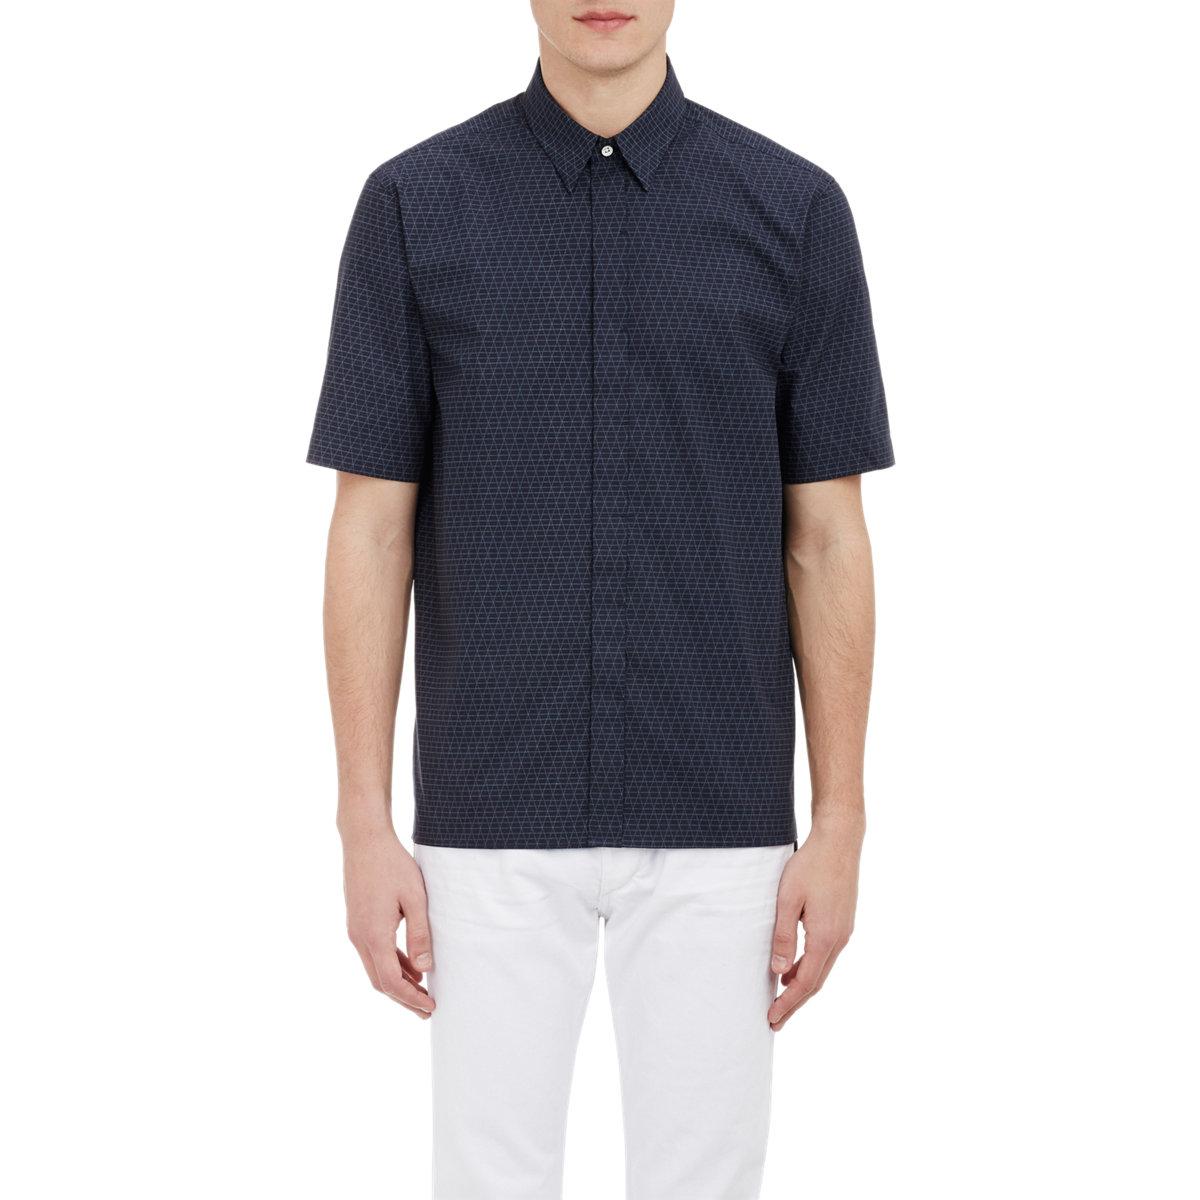 Rag Bone Casper Shirt Blue Size Xl In Blue For Men Lyst